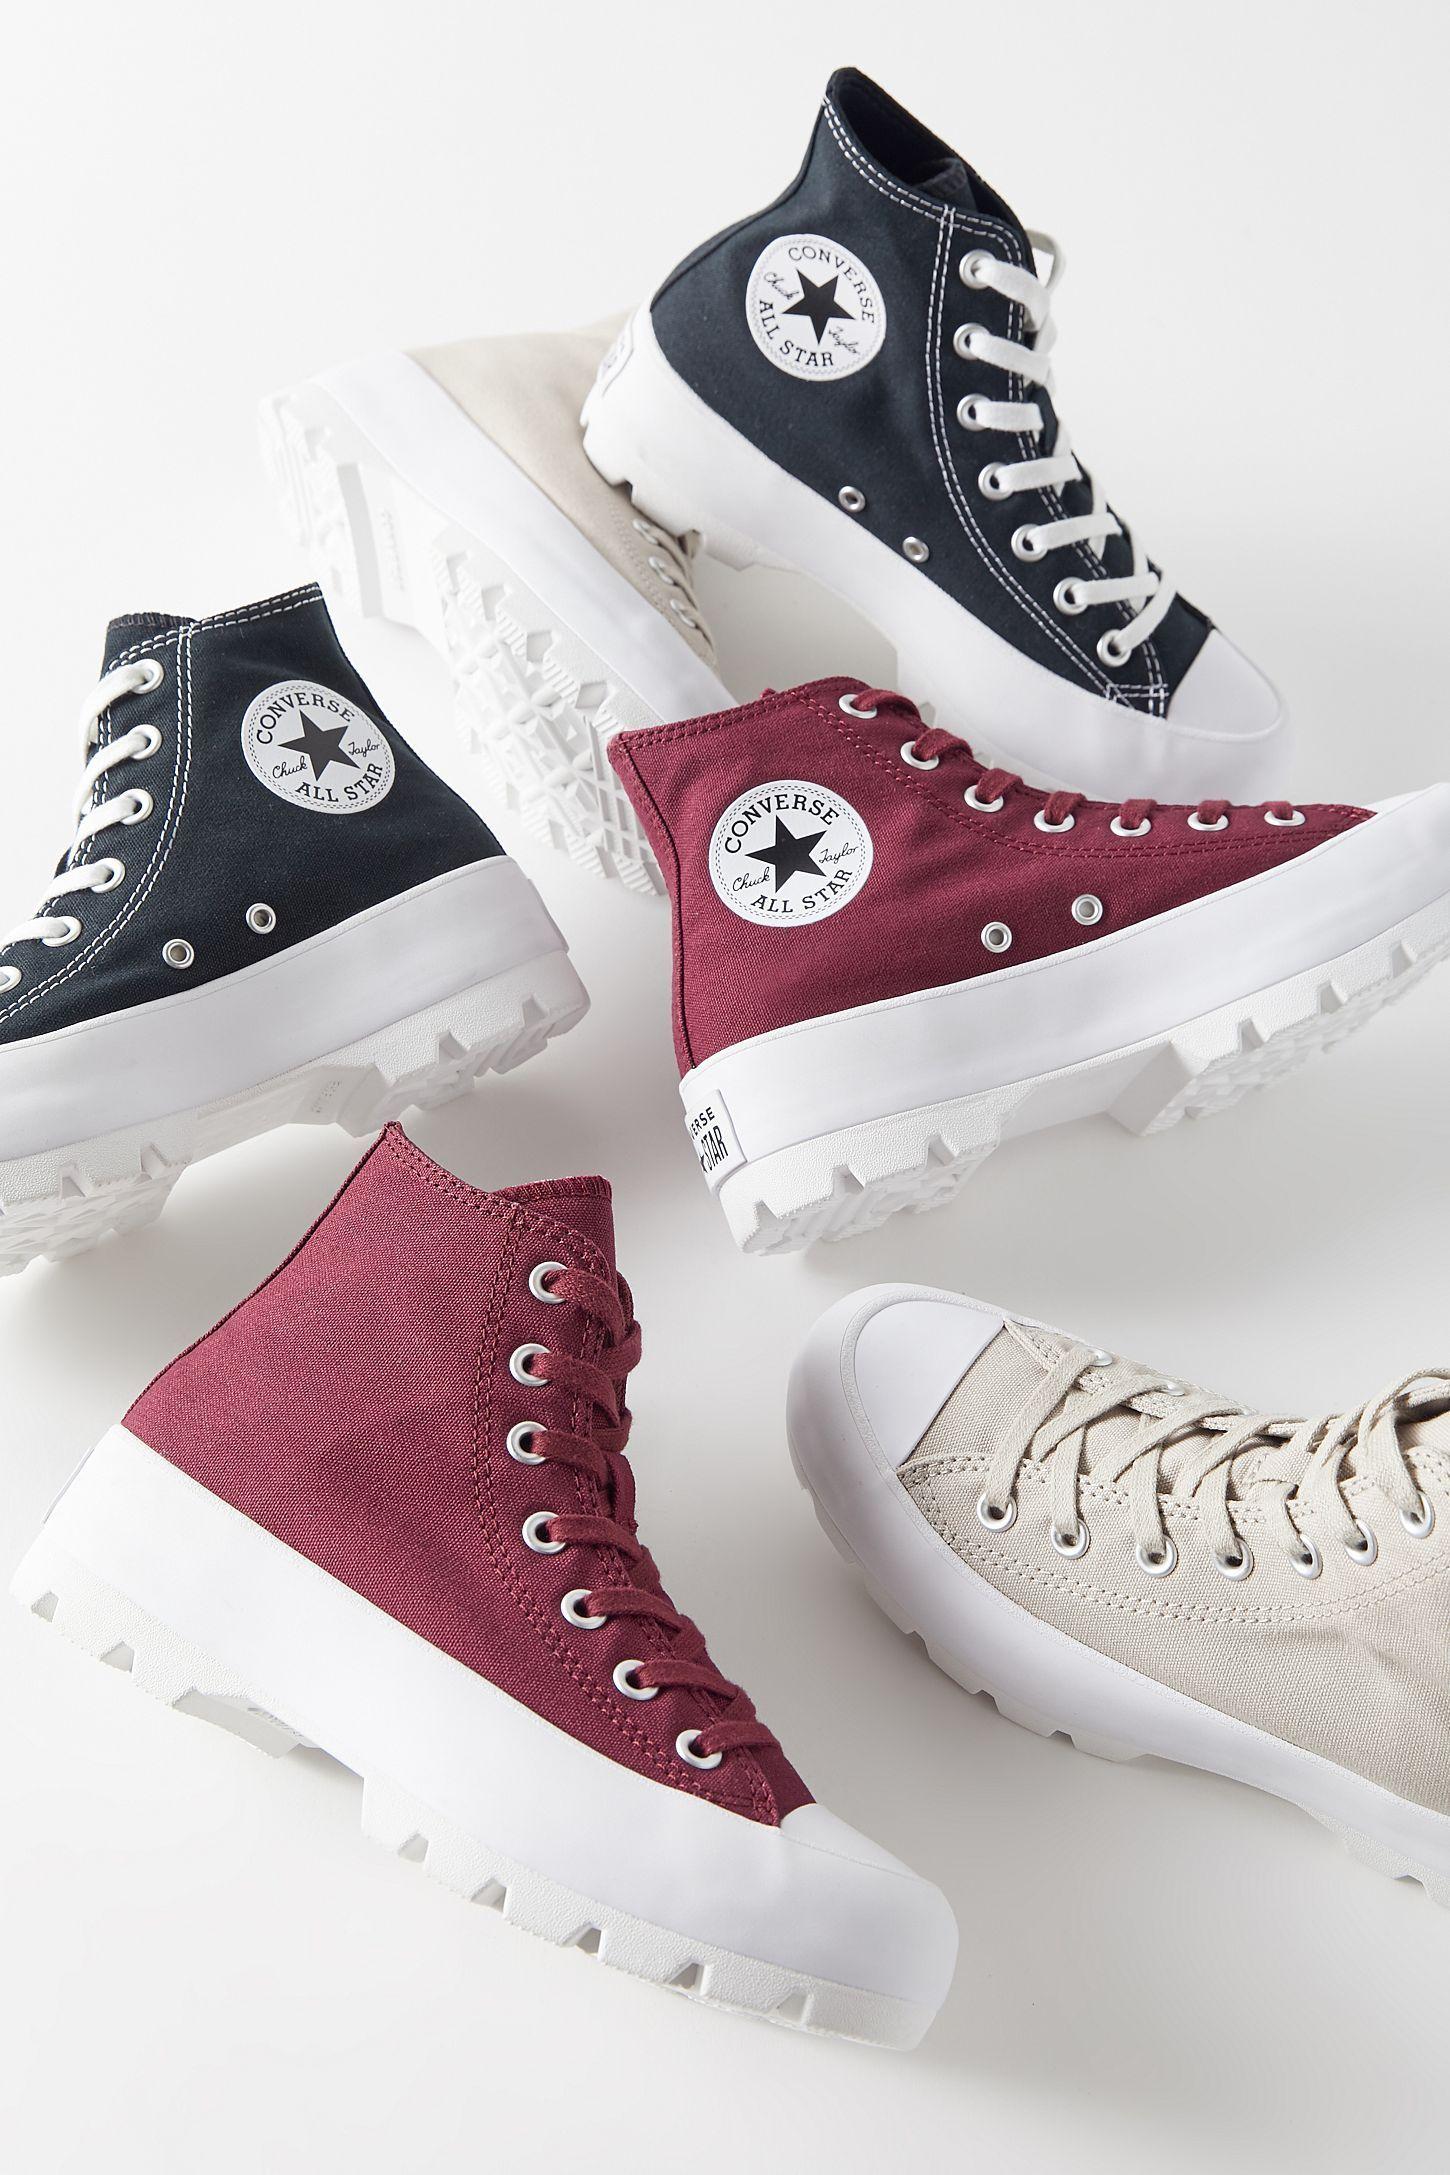 Converse Chuck Taylor All Star Lugged High Top Sneaker | Urban ...